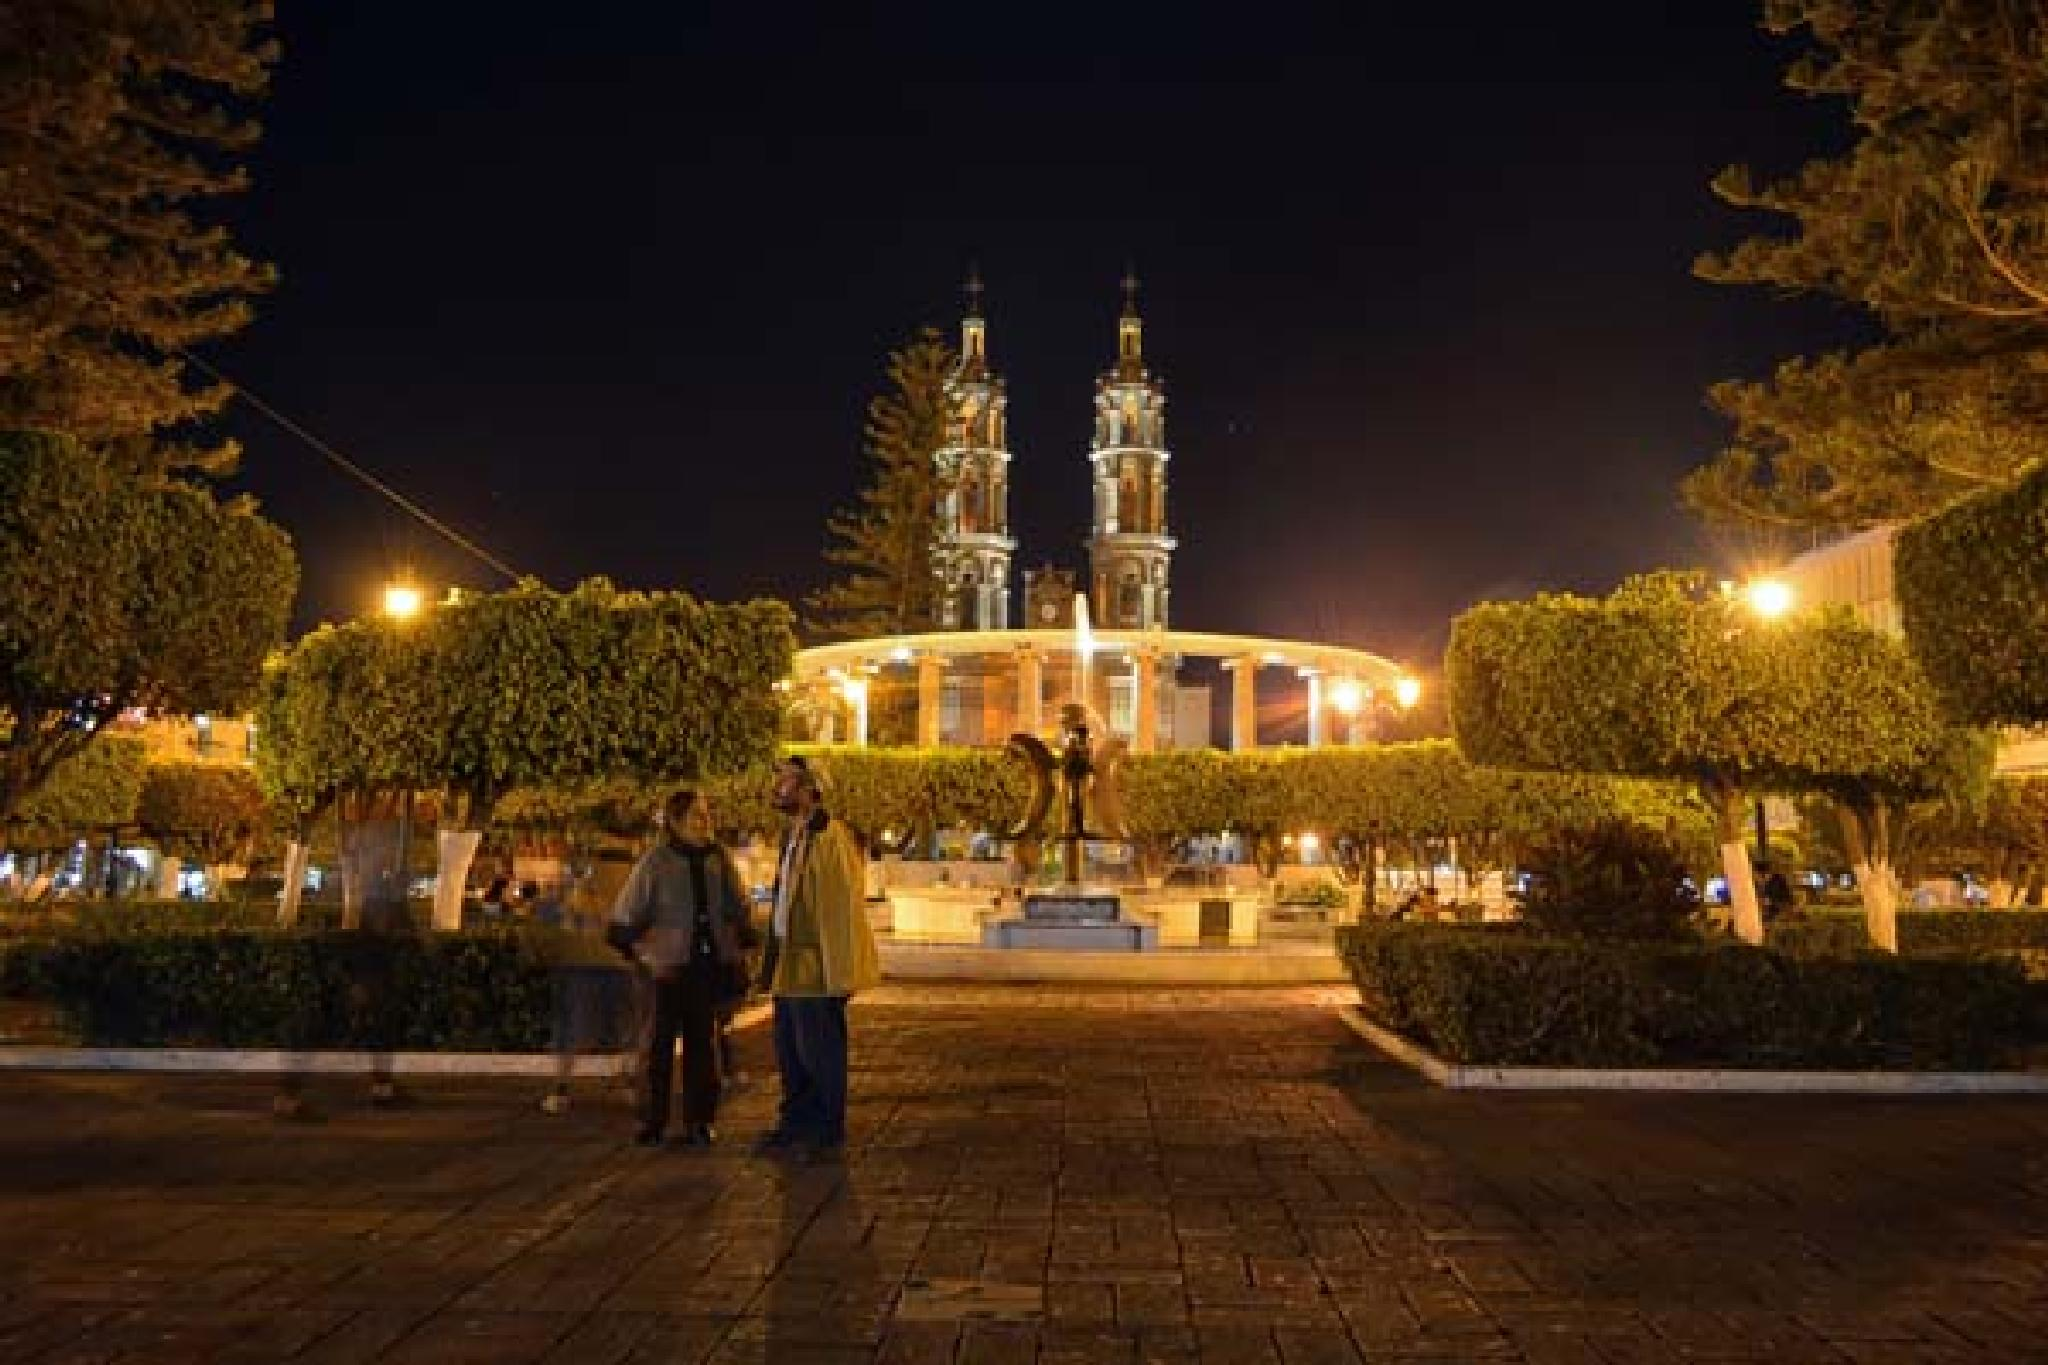 plaza las armas by f5.6 artstreet